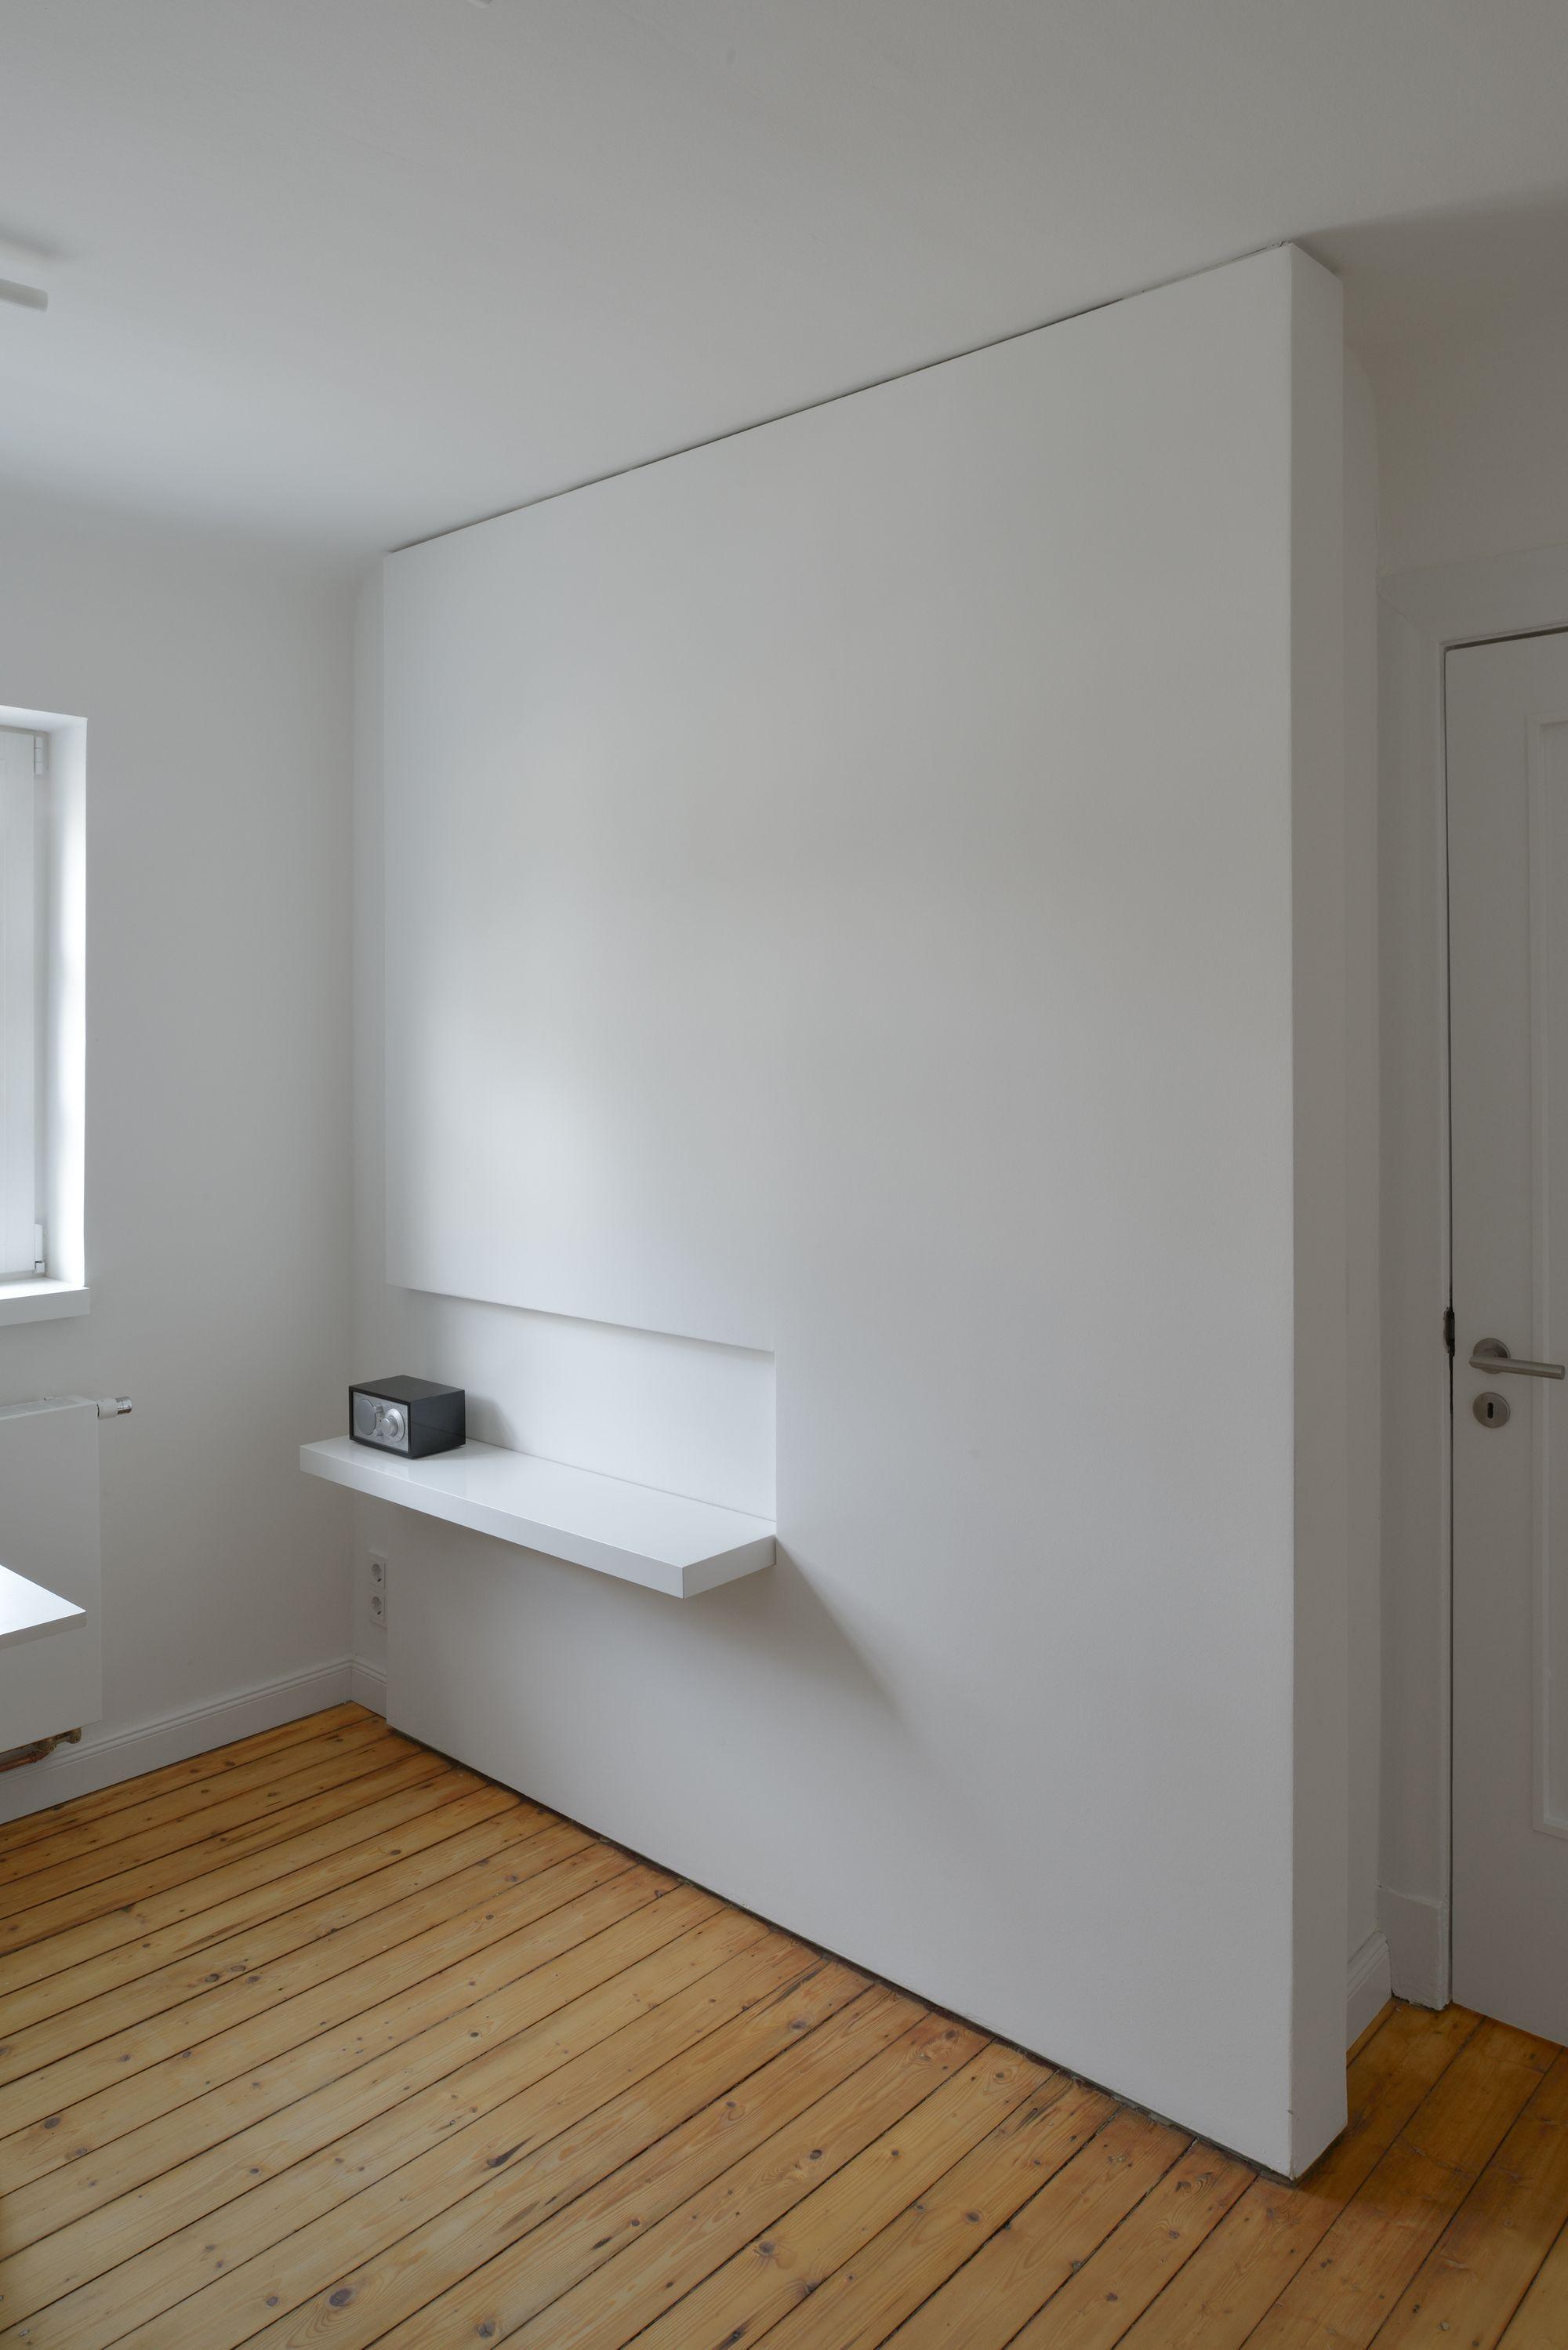 Sanierung Wohngebaude e113